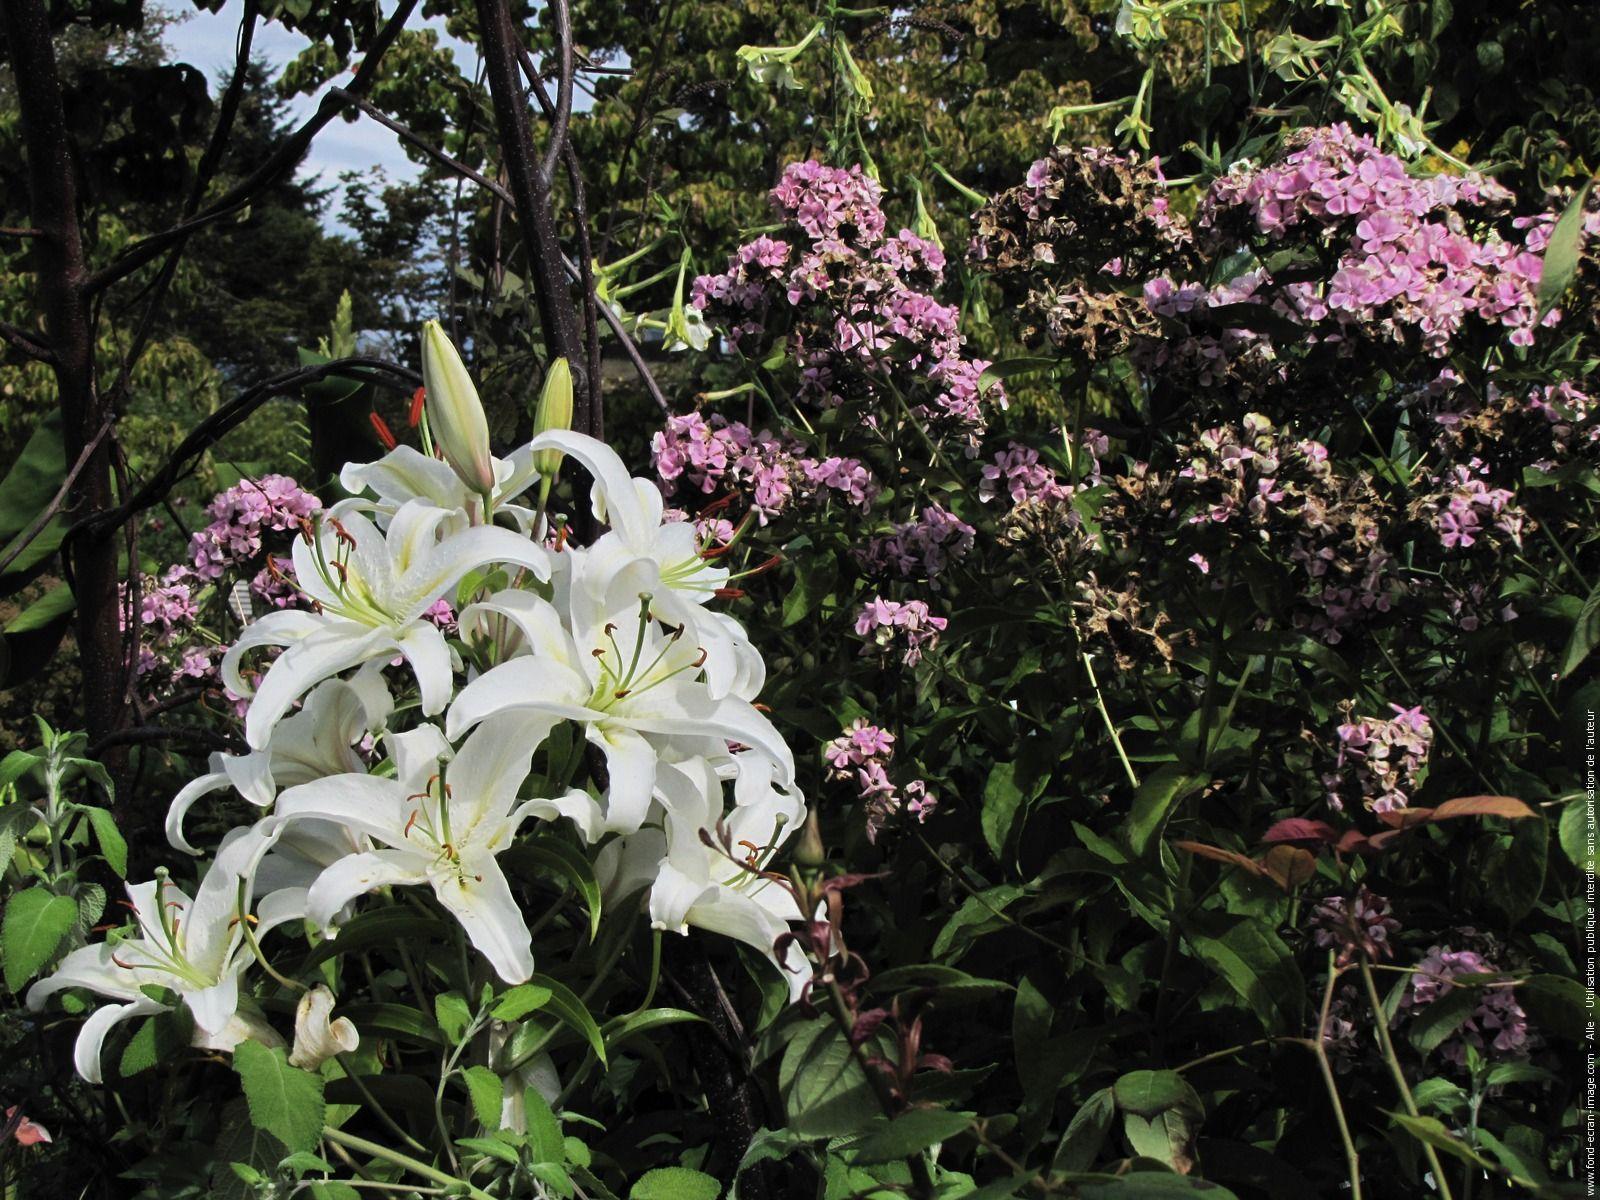 Lys Blanc 20150914 Sur Fei Photo Fleurs Jardins Lys Blancs